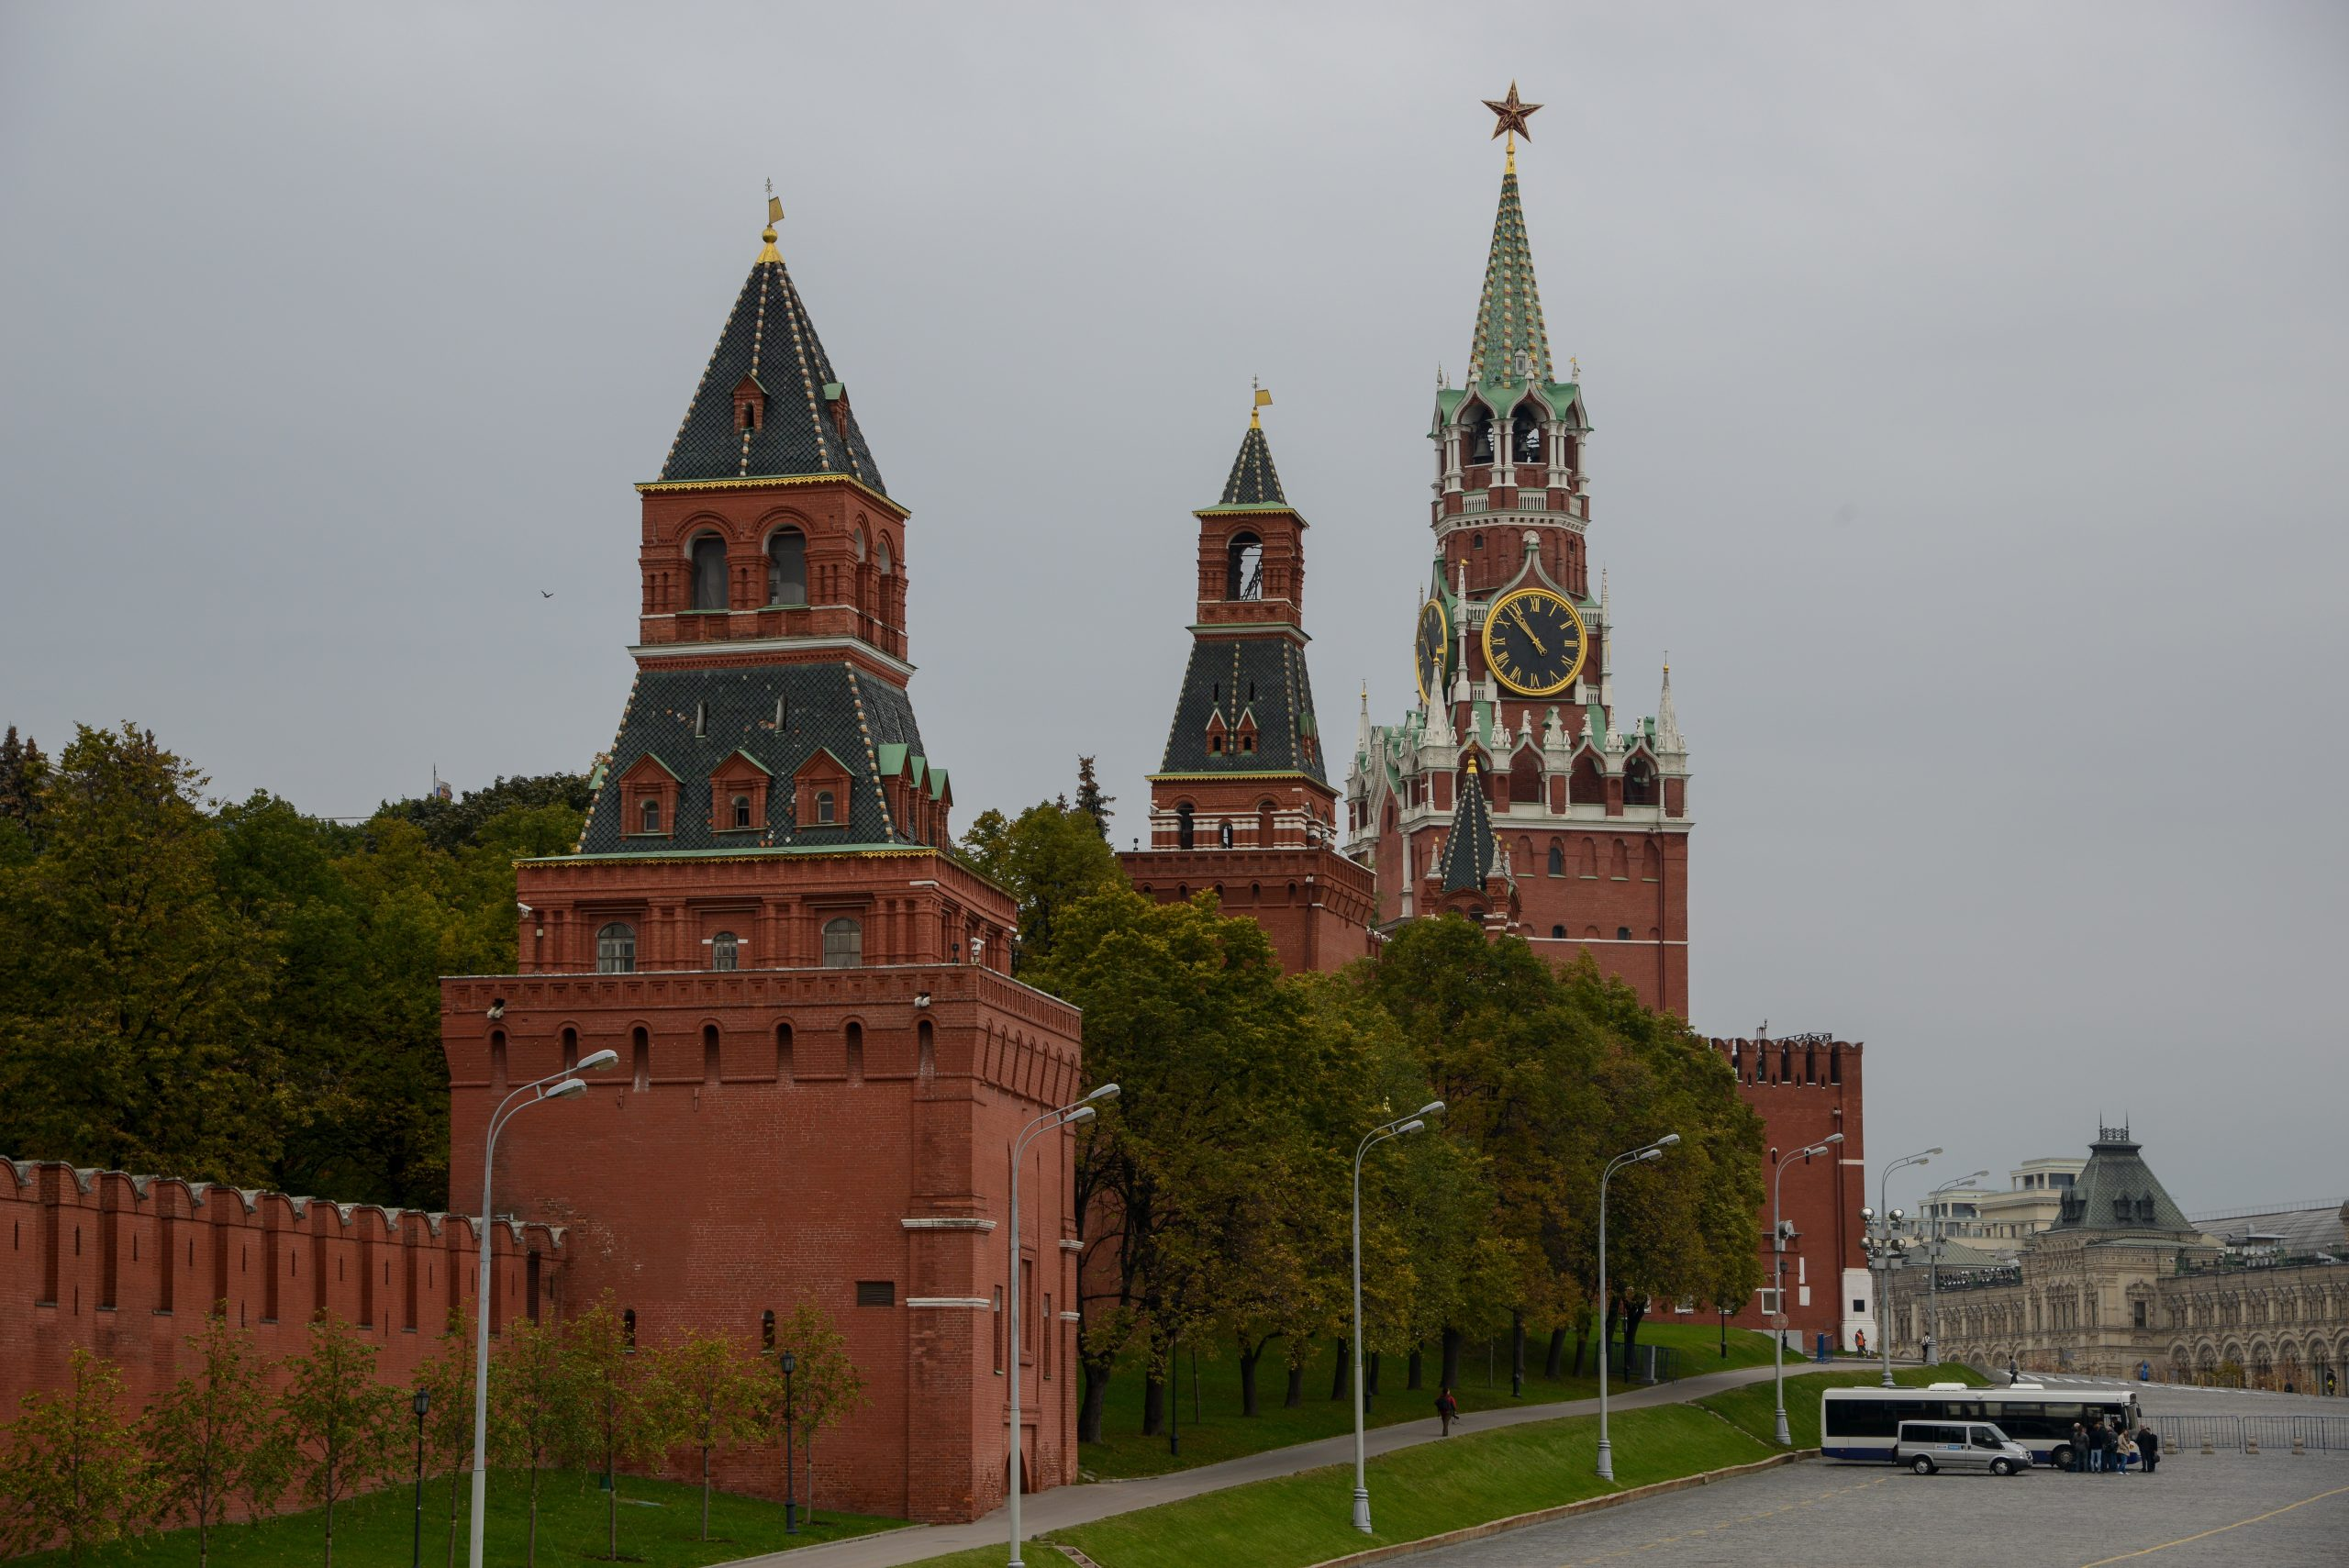 Rusia, atac pervers la Armata Română. Vine de la Chişinău! Este vorba despre mii de morți